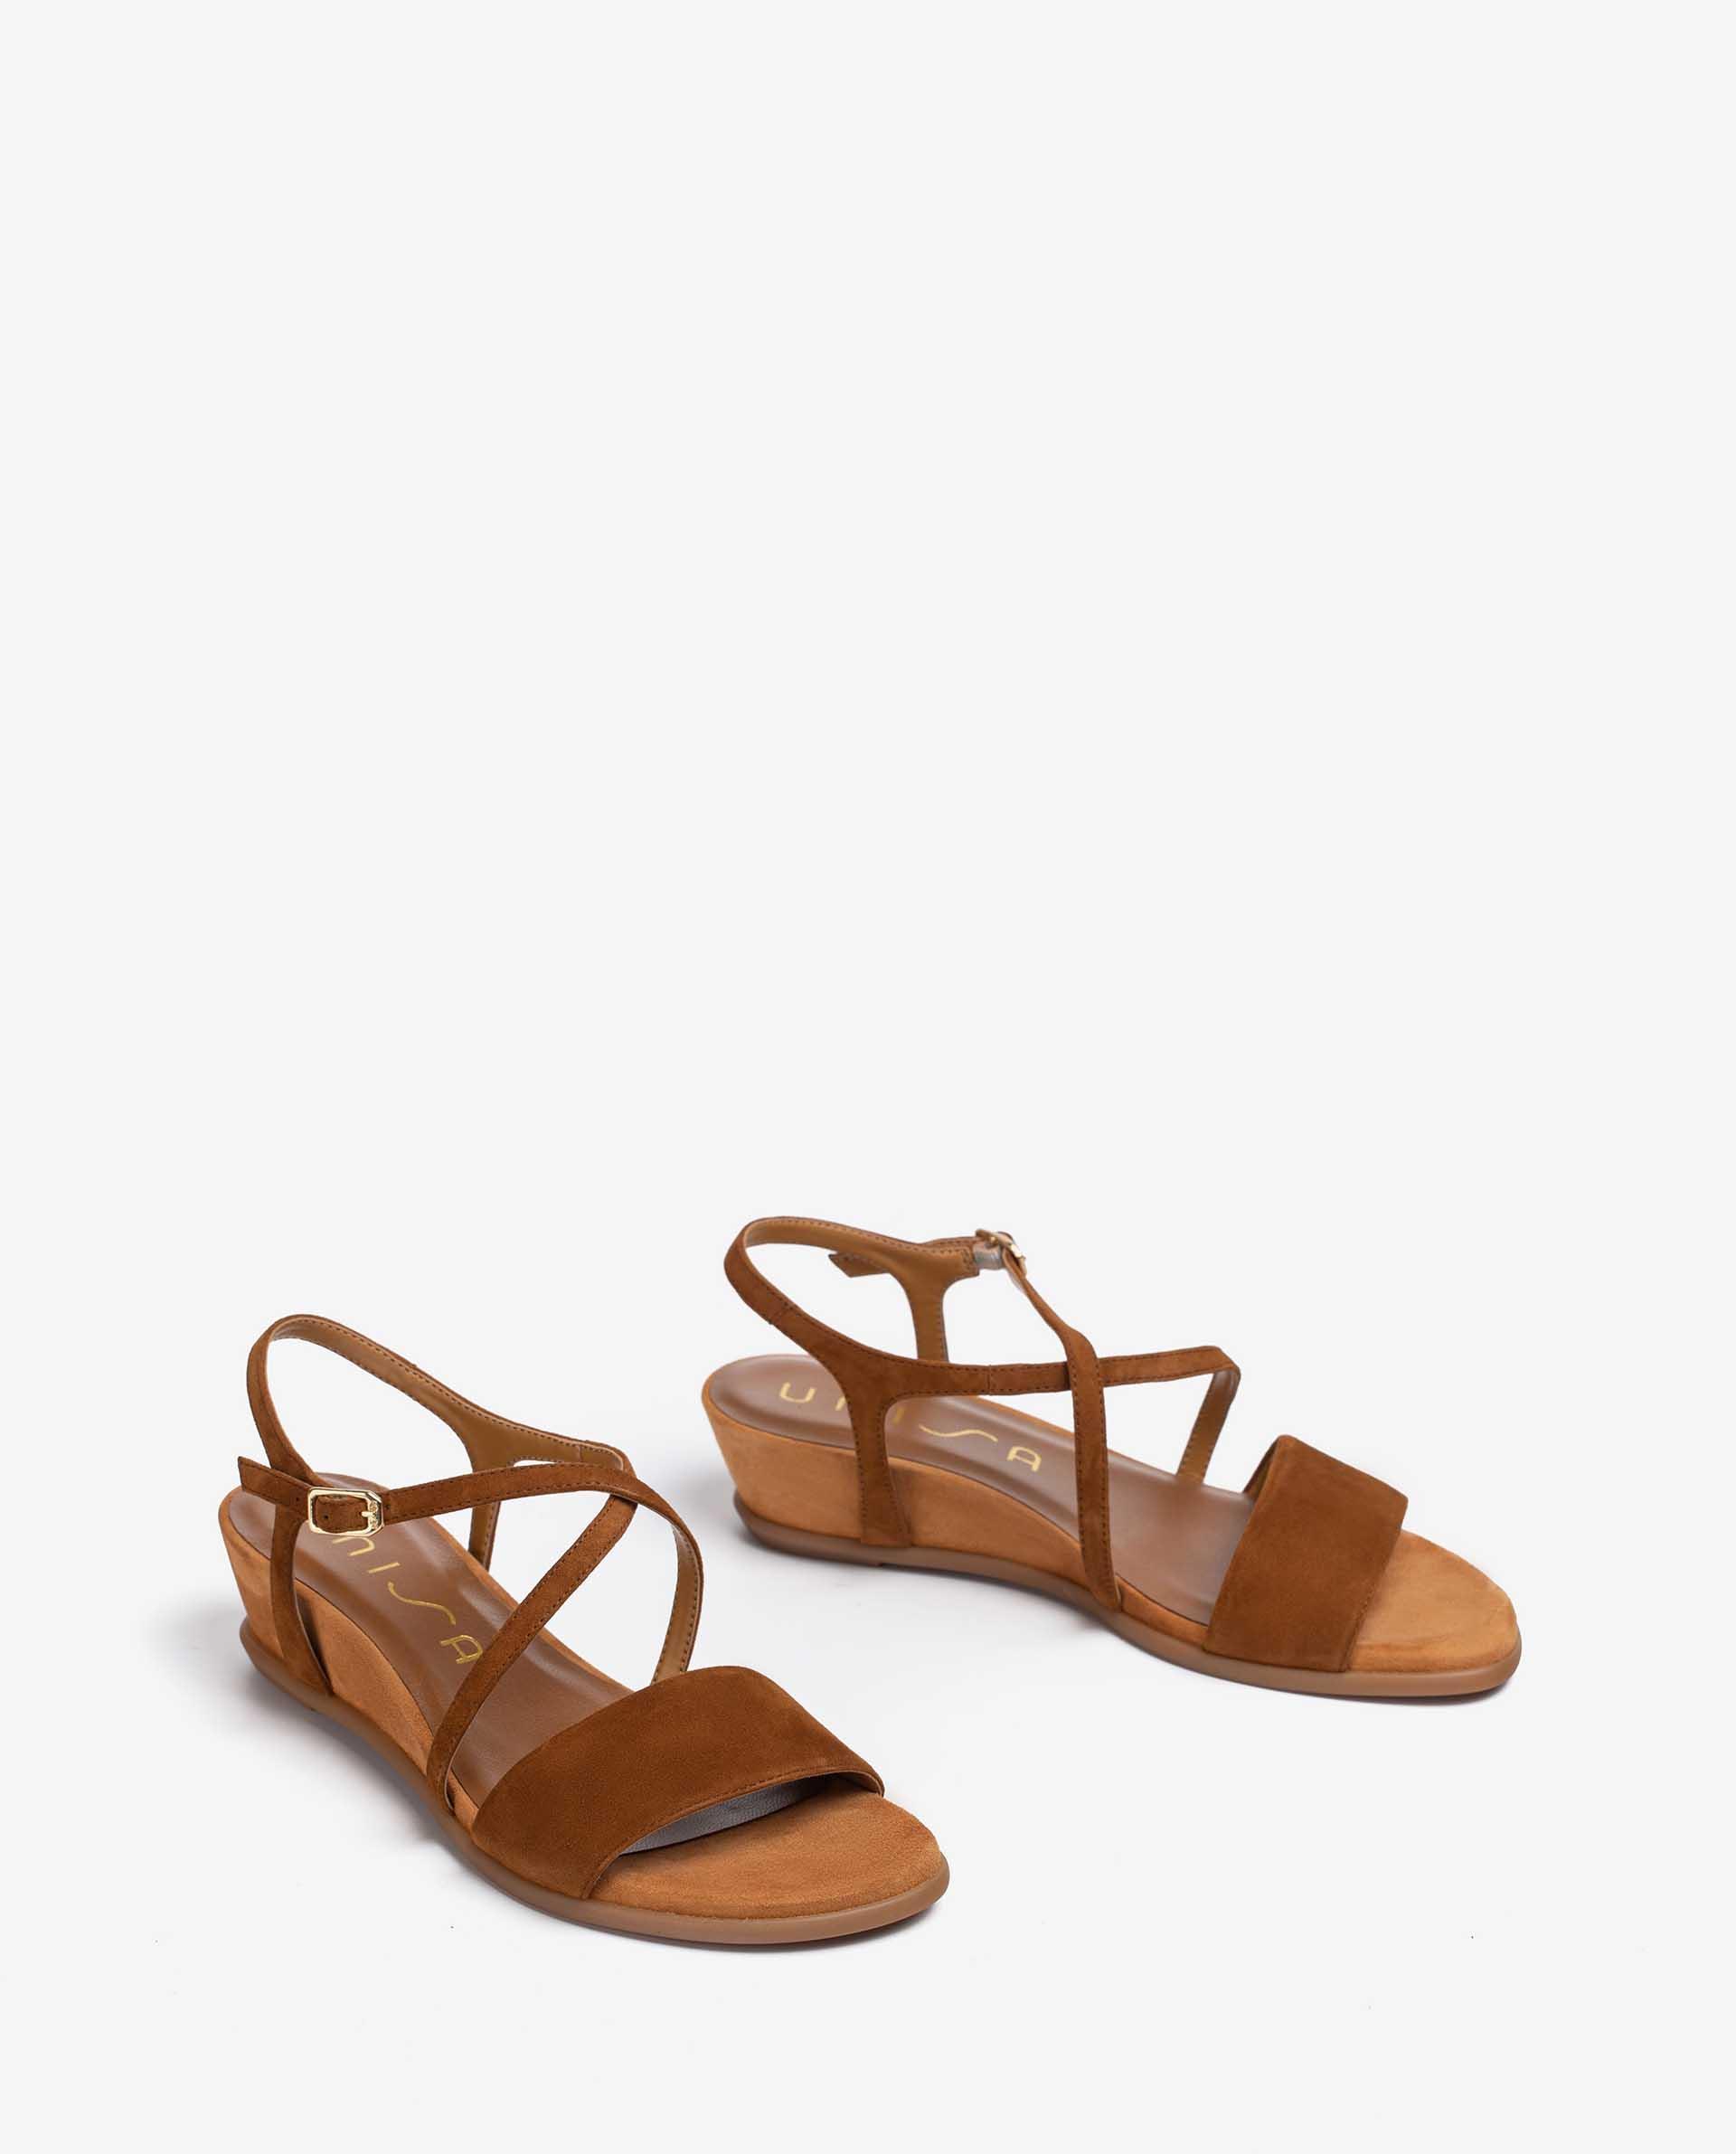 UNISA Kid suede sandals with instep strap BAKIOSIN_KS 2